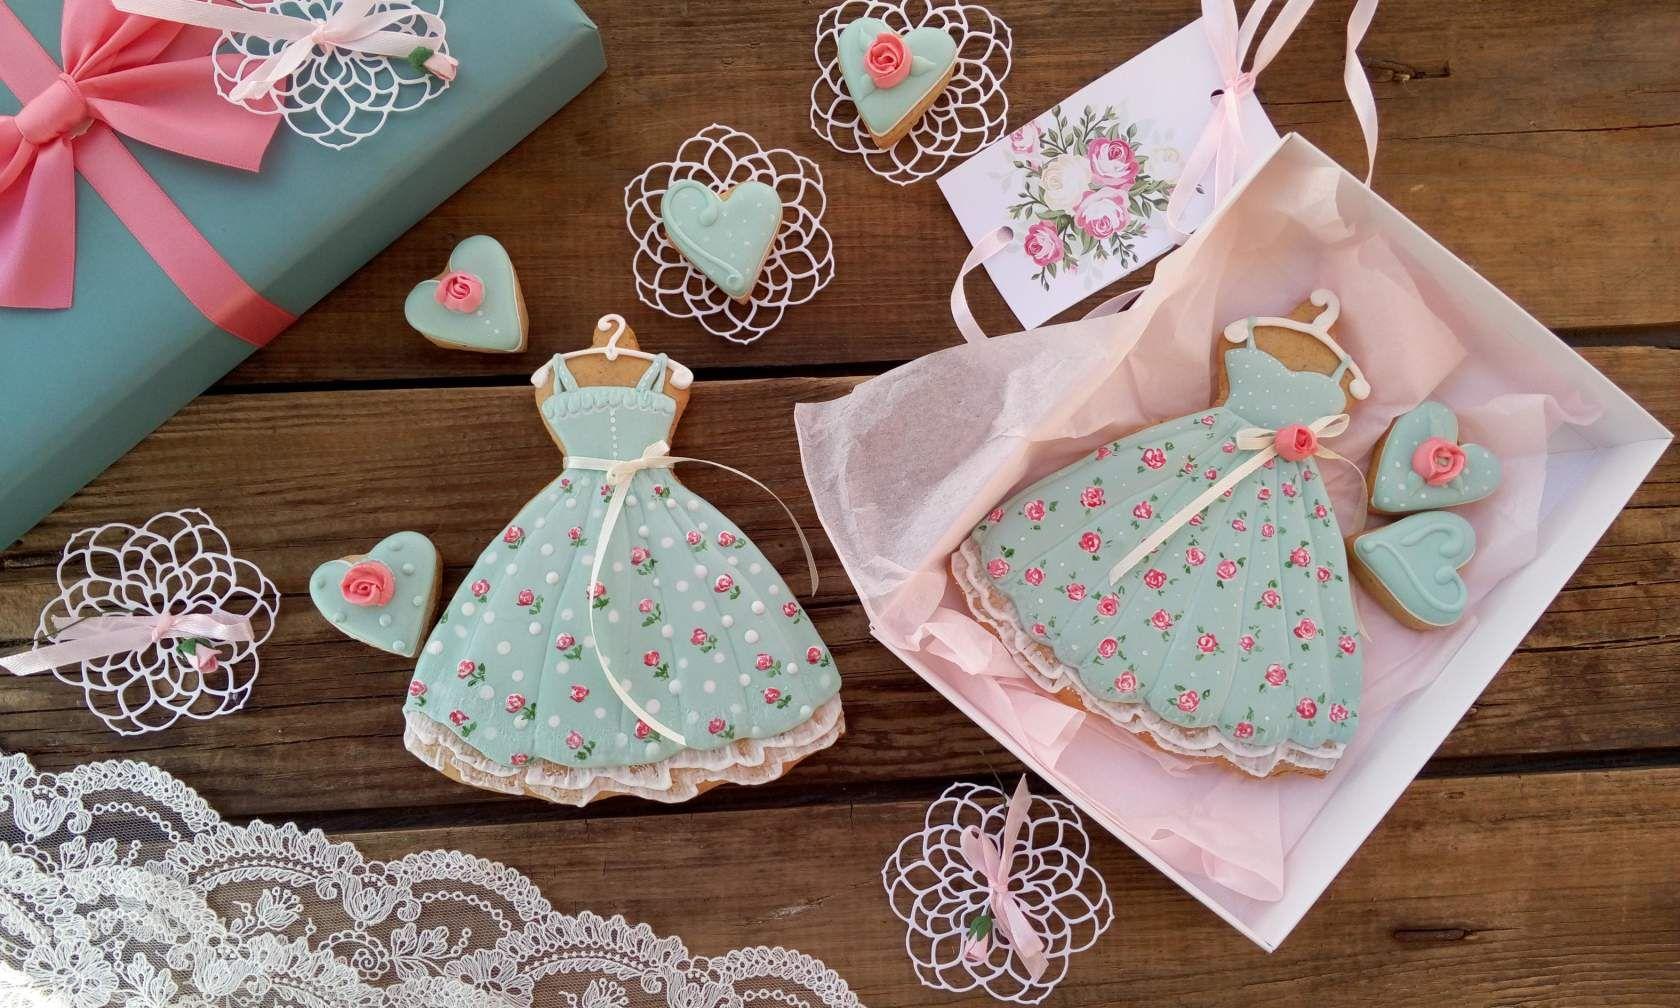 имбирныепряники #медовыепряники ##печеньевалматы #пряникивалматы #айсинг #алматы #cookies #cookieart #cookiedecor #cookiedecorating #handmade #royalicing